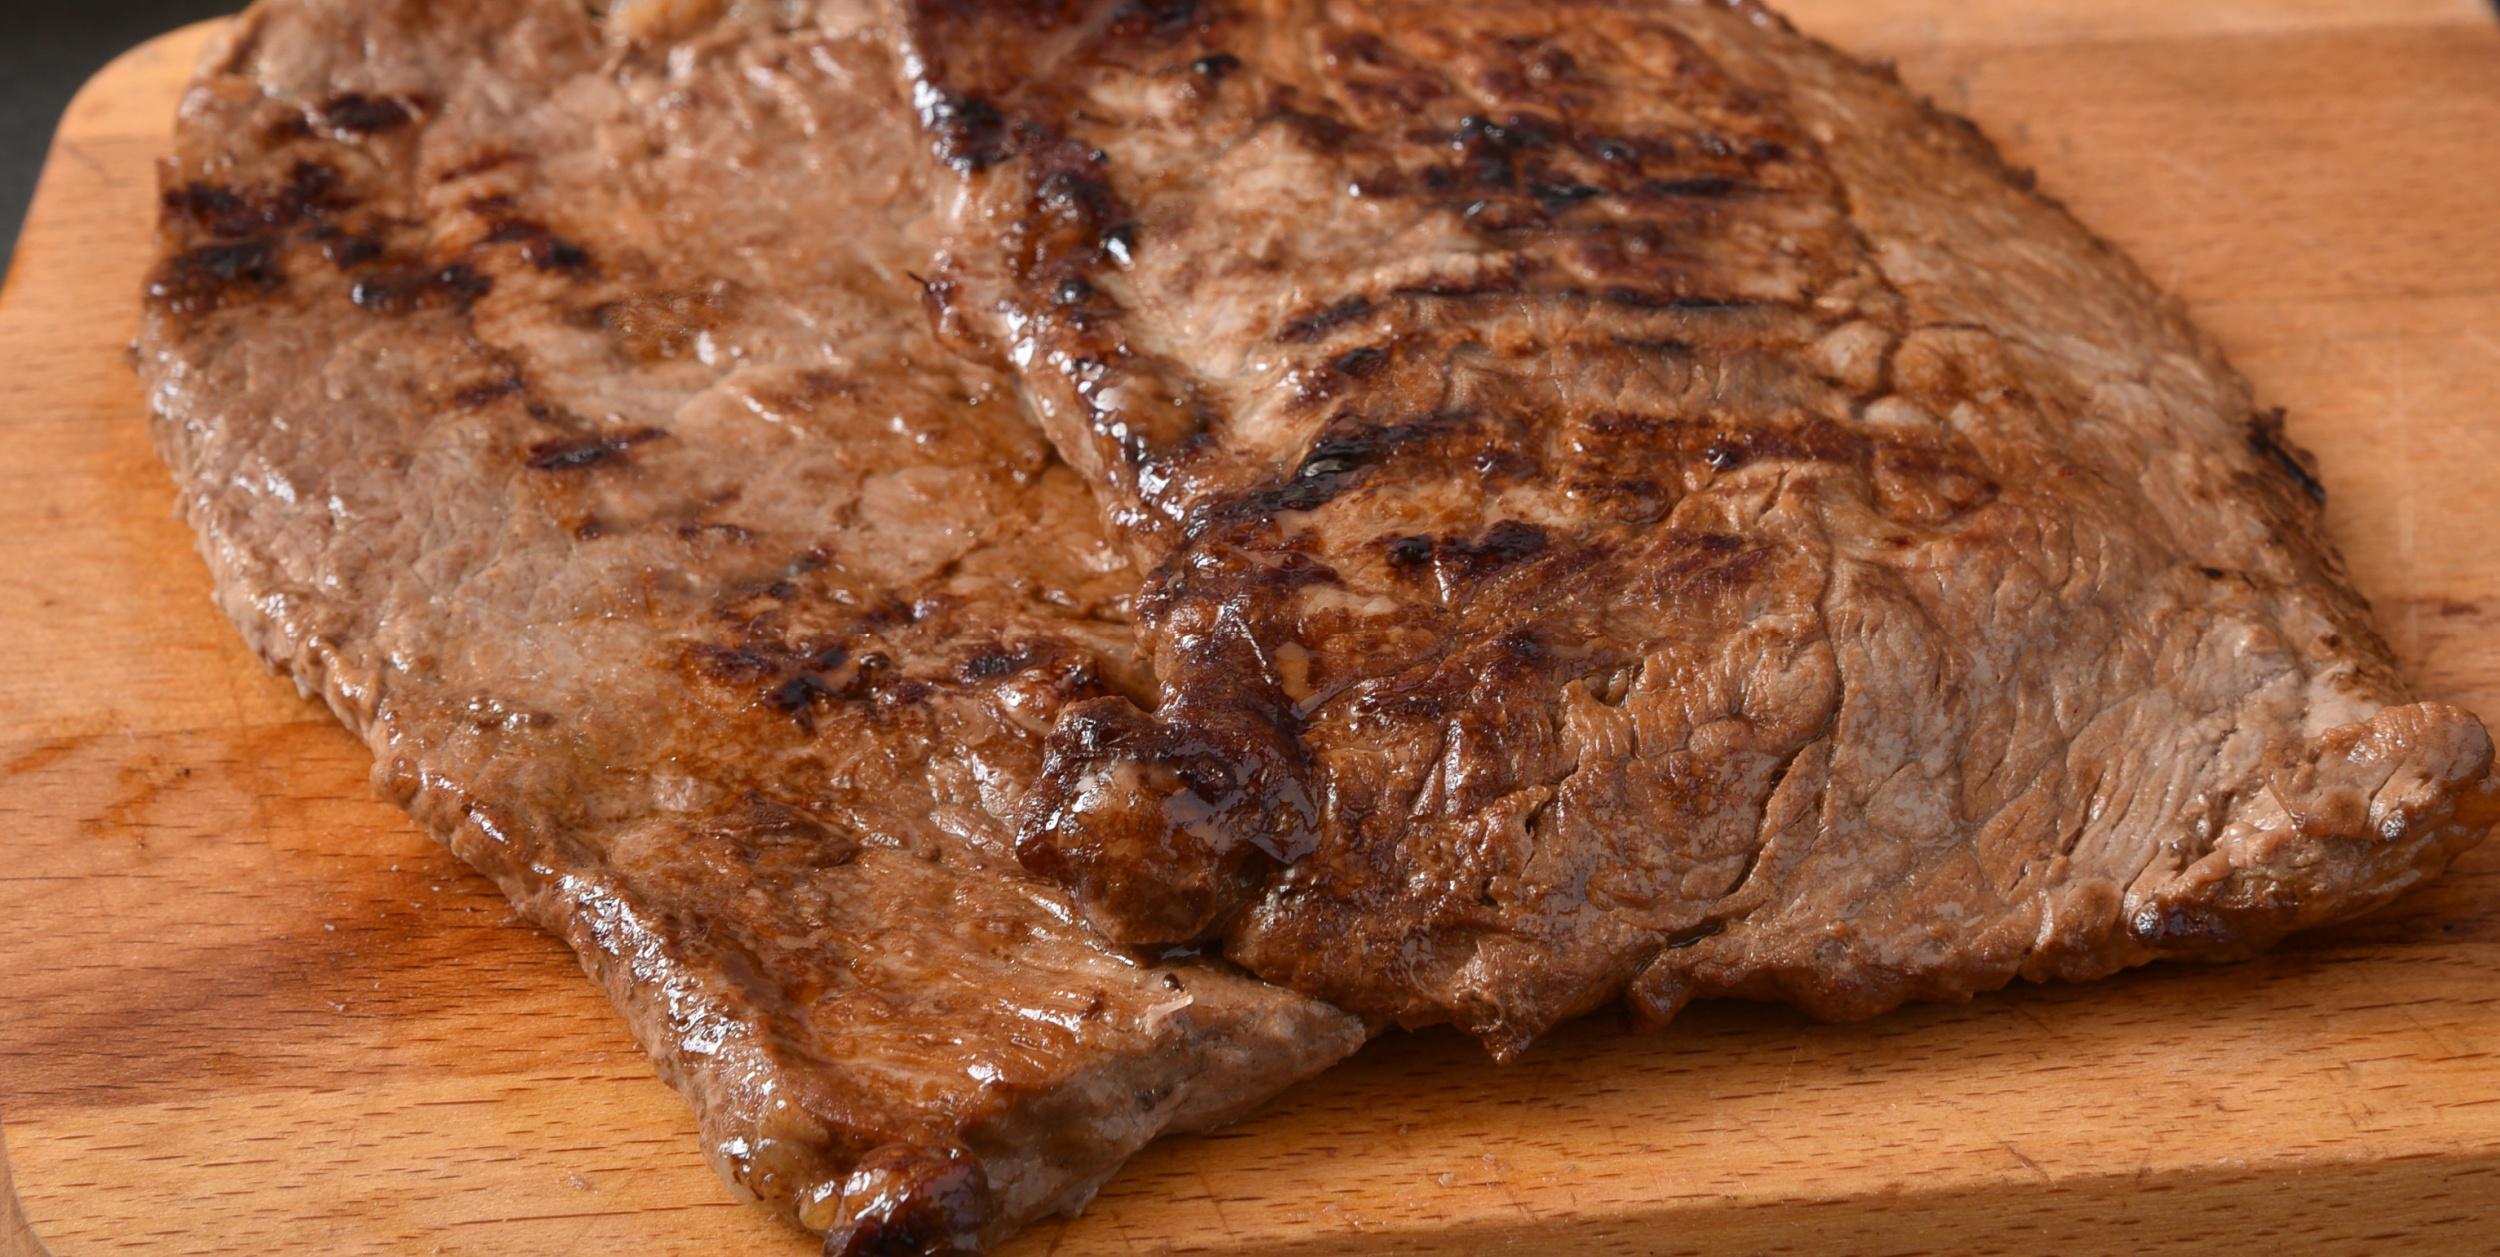 Fresh panfried Cuban steaks on a cutting board